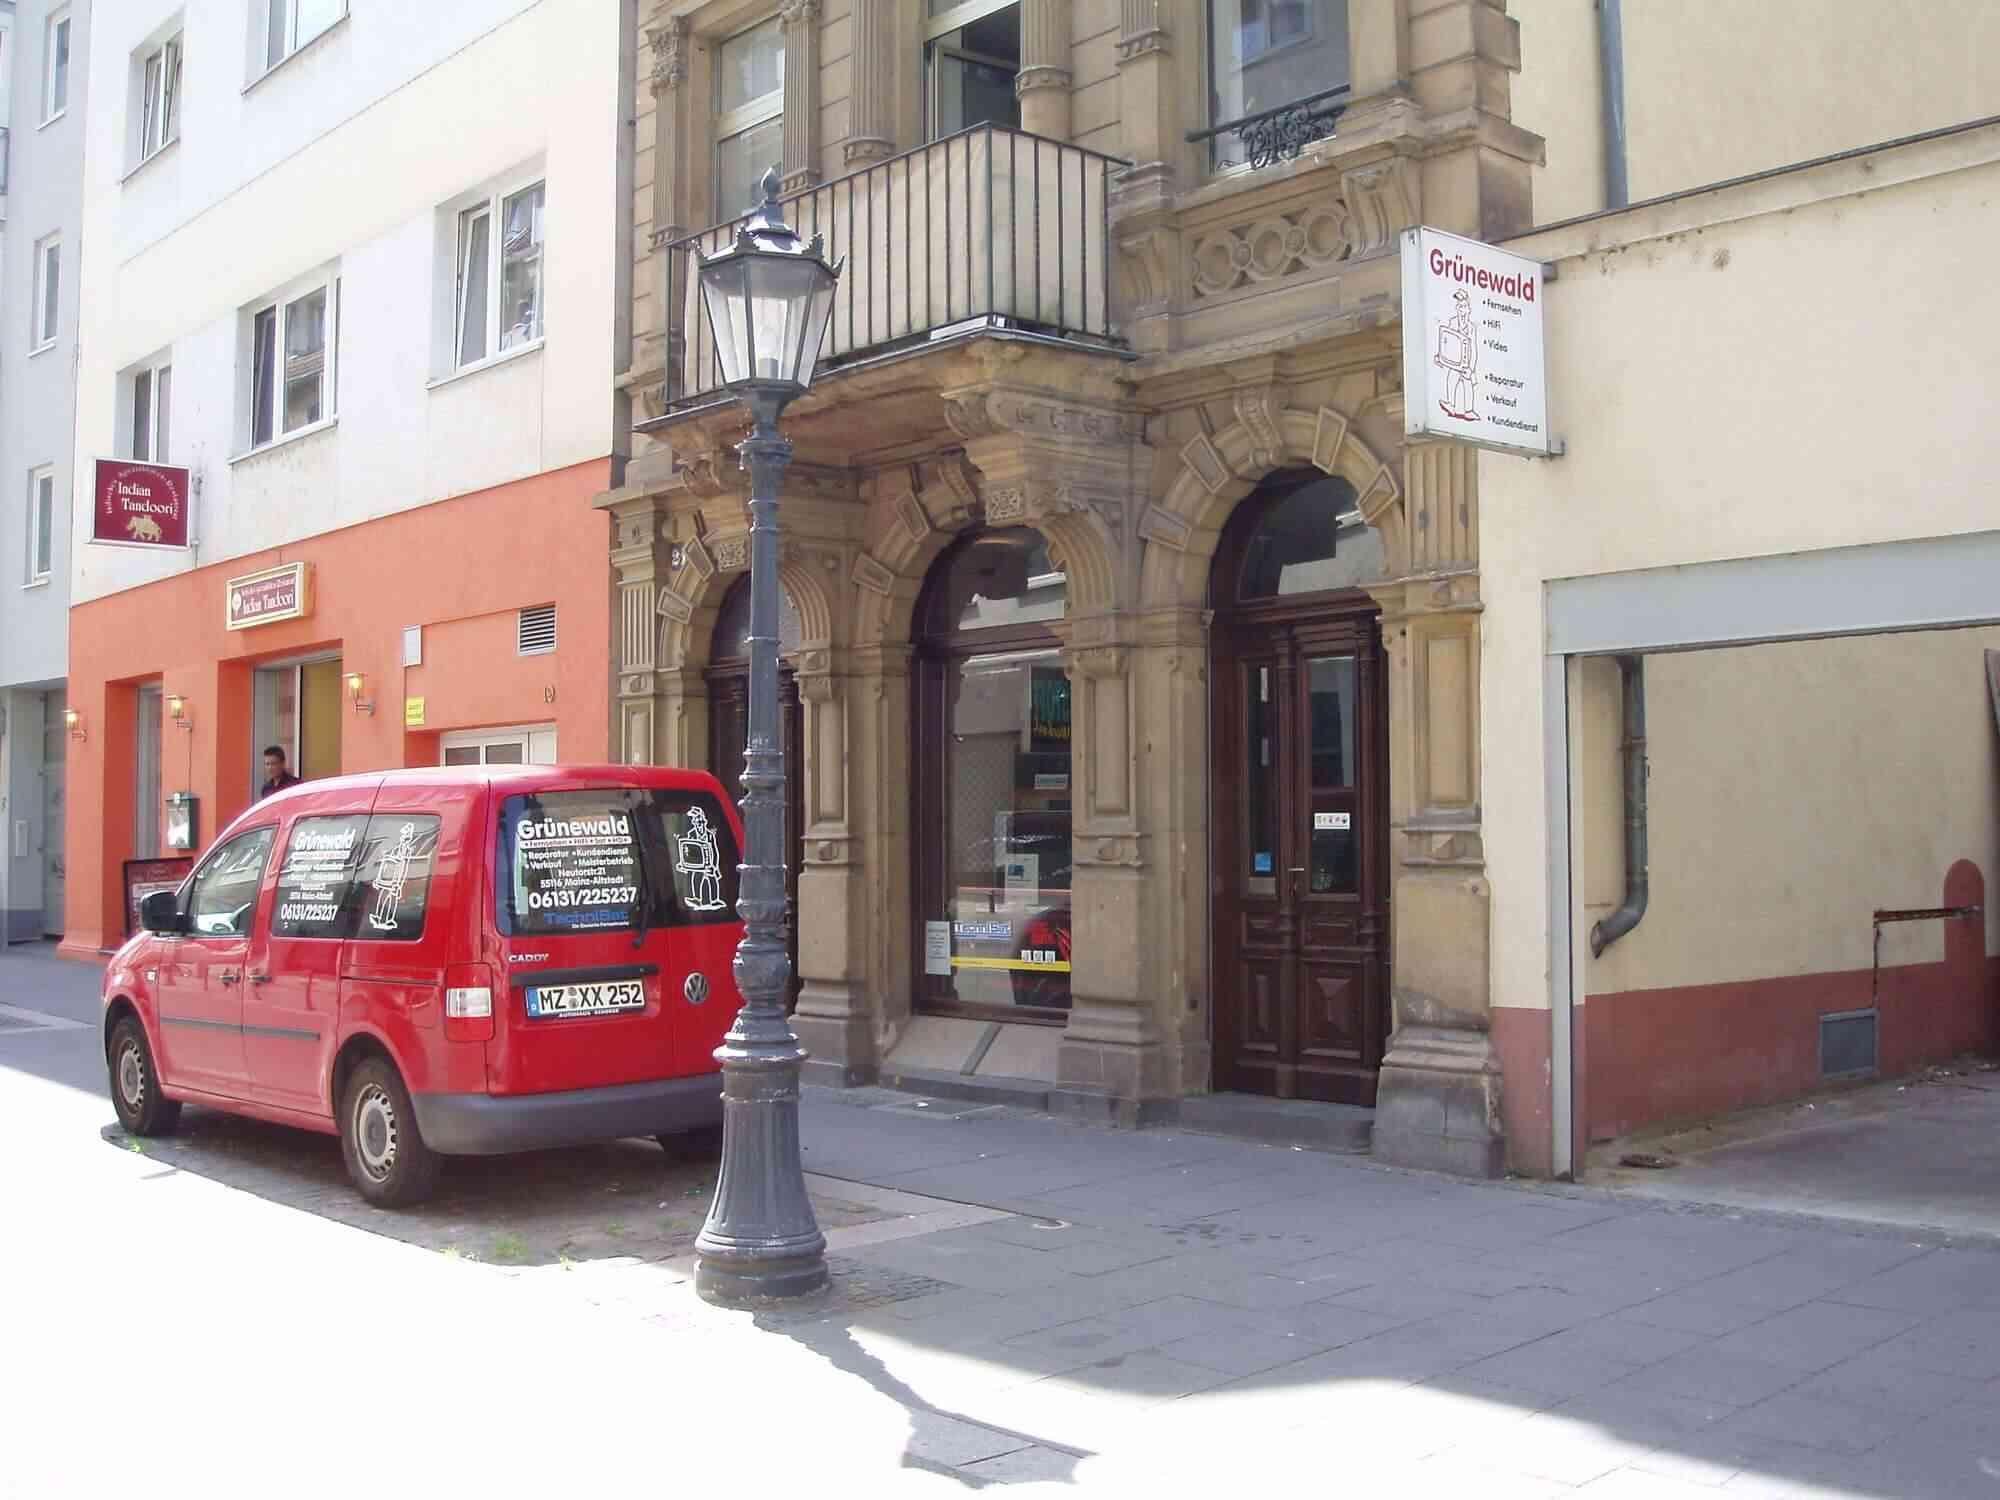 Grünewald Mainz